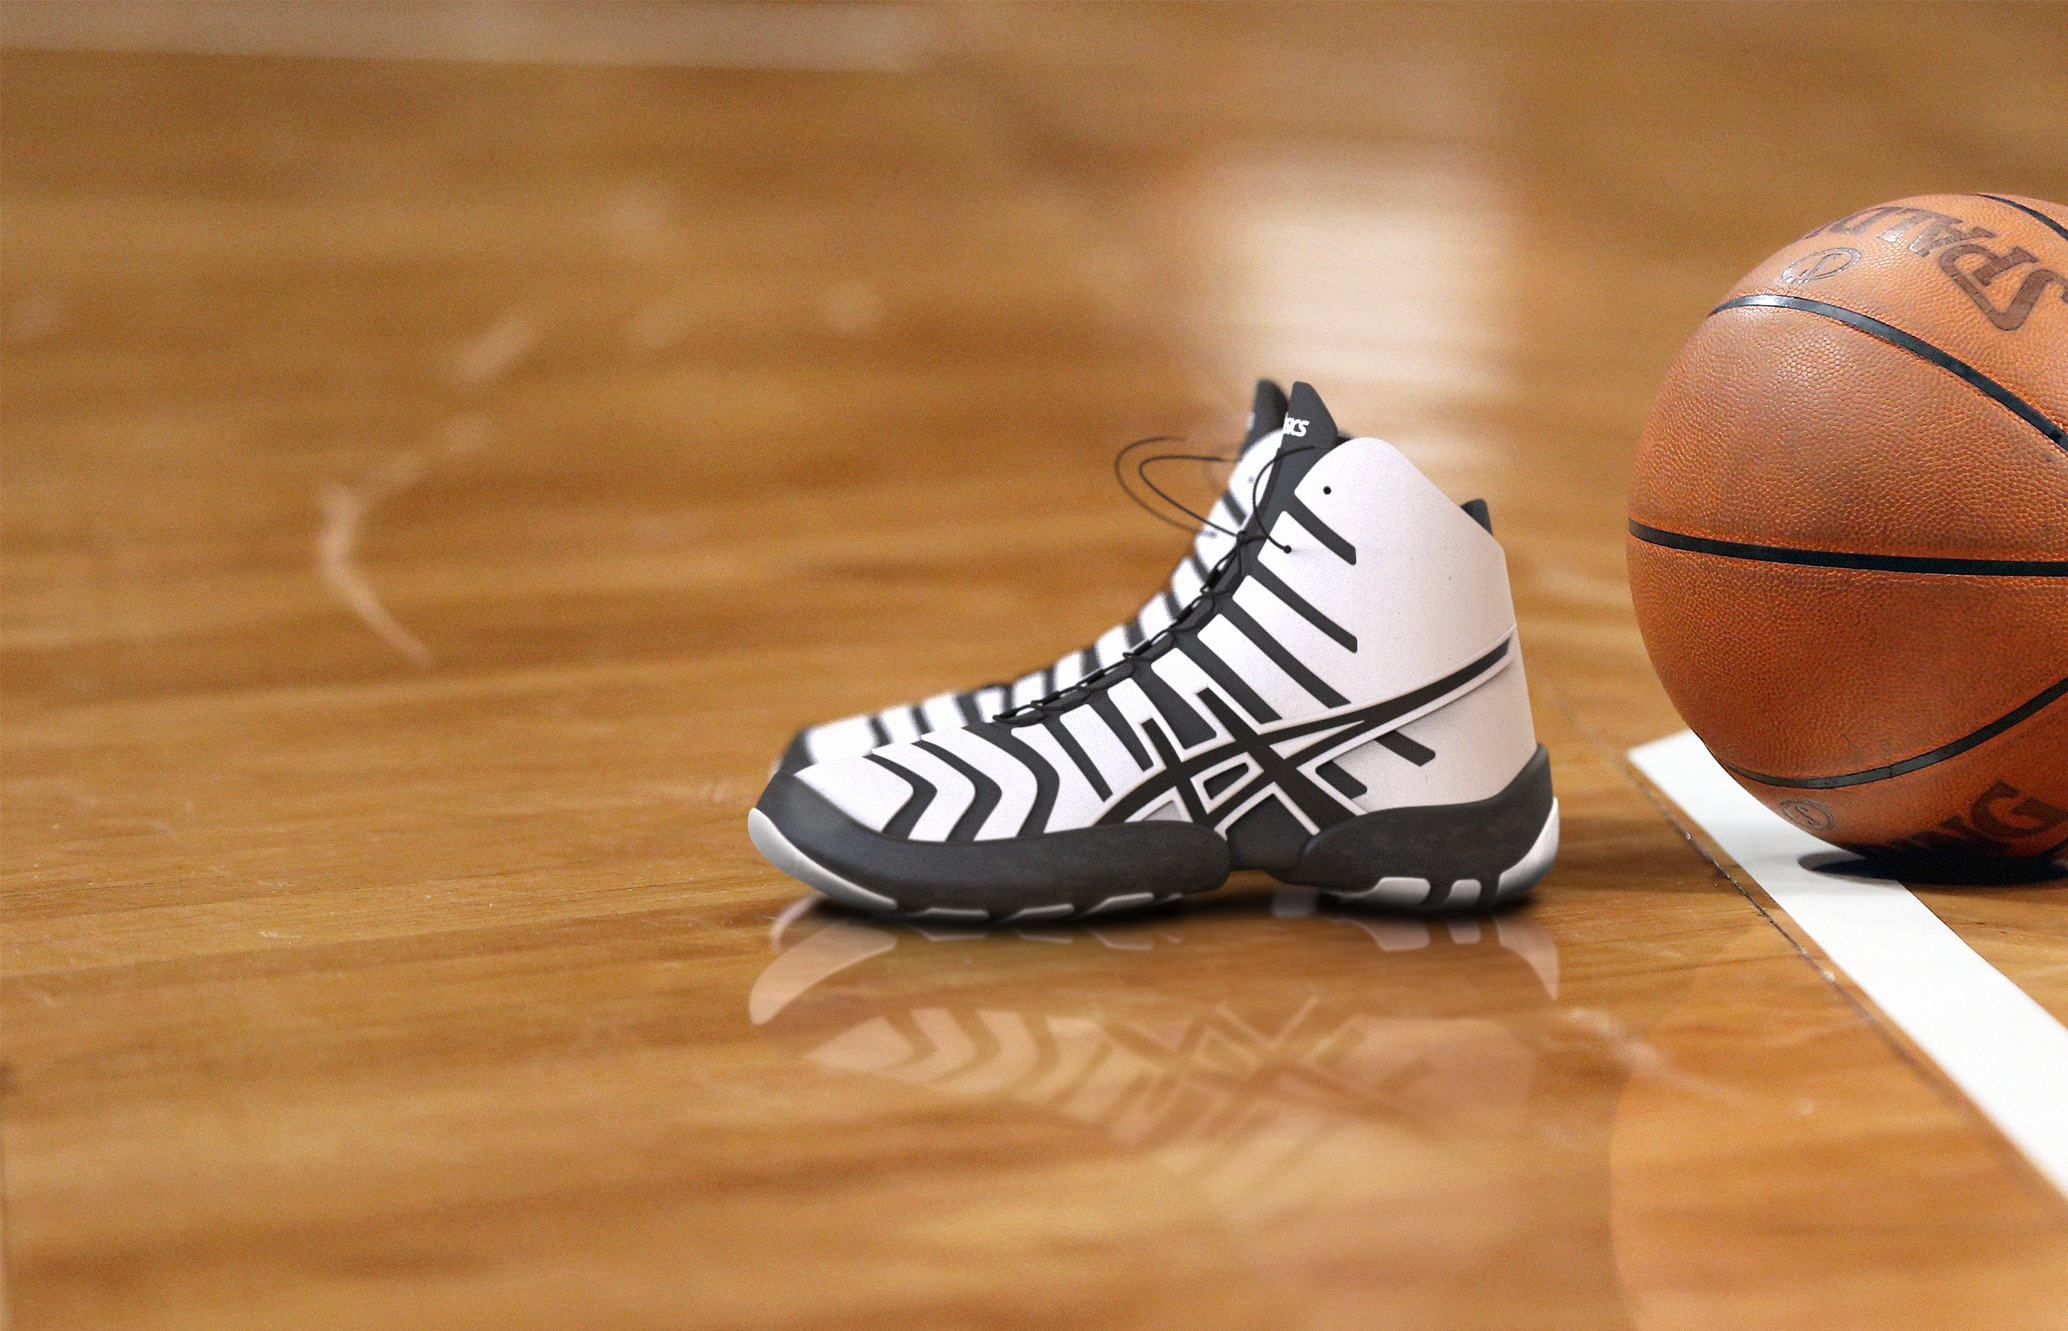 0a3595935fb0b Shoes Shoes Asics Basketball Shoes Asics Shoes Asics Asics Basketball Asics  Basketball Basketball 1S8rtnSx